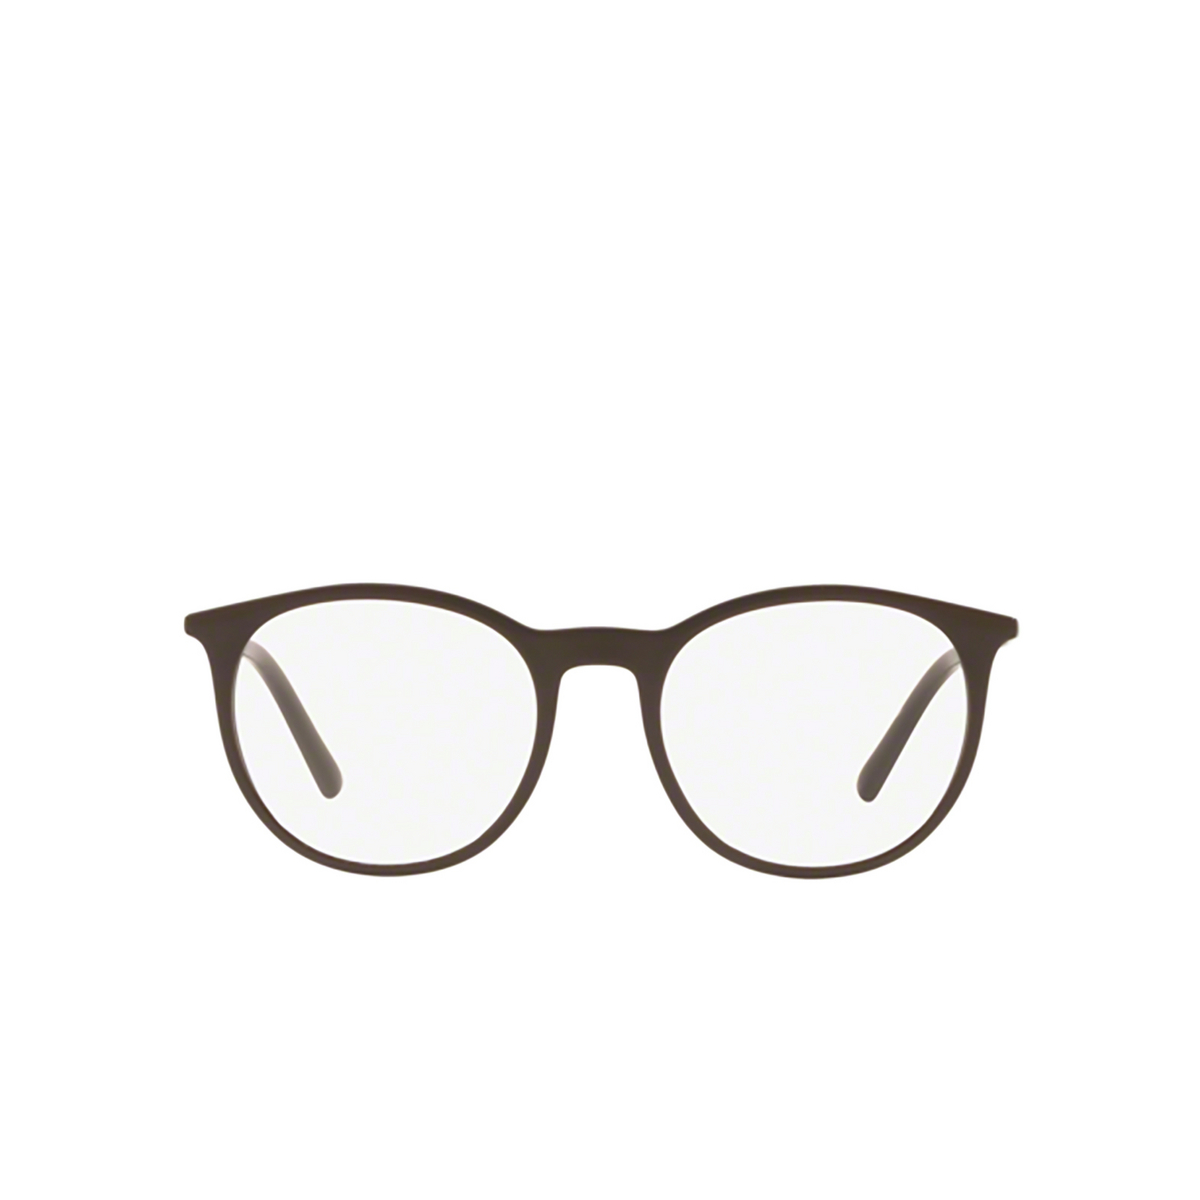 Dolce & Gabbana® Round Eyeglasses: DG5031 color 3042 - front view.